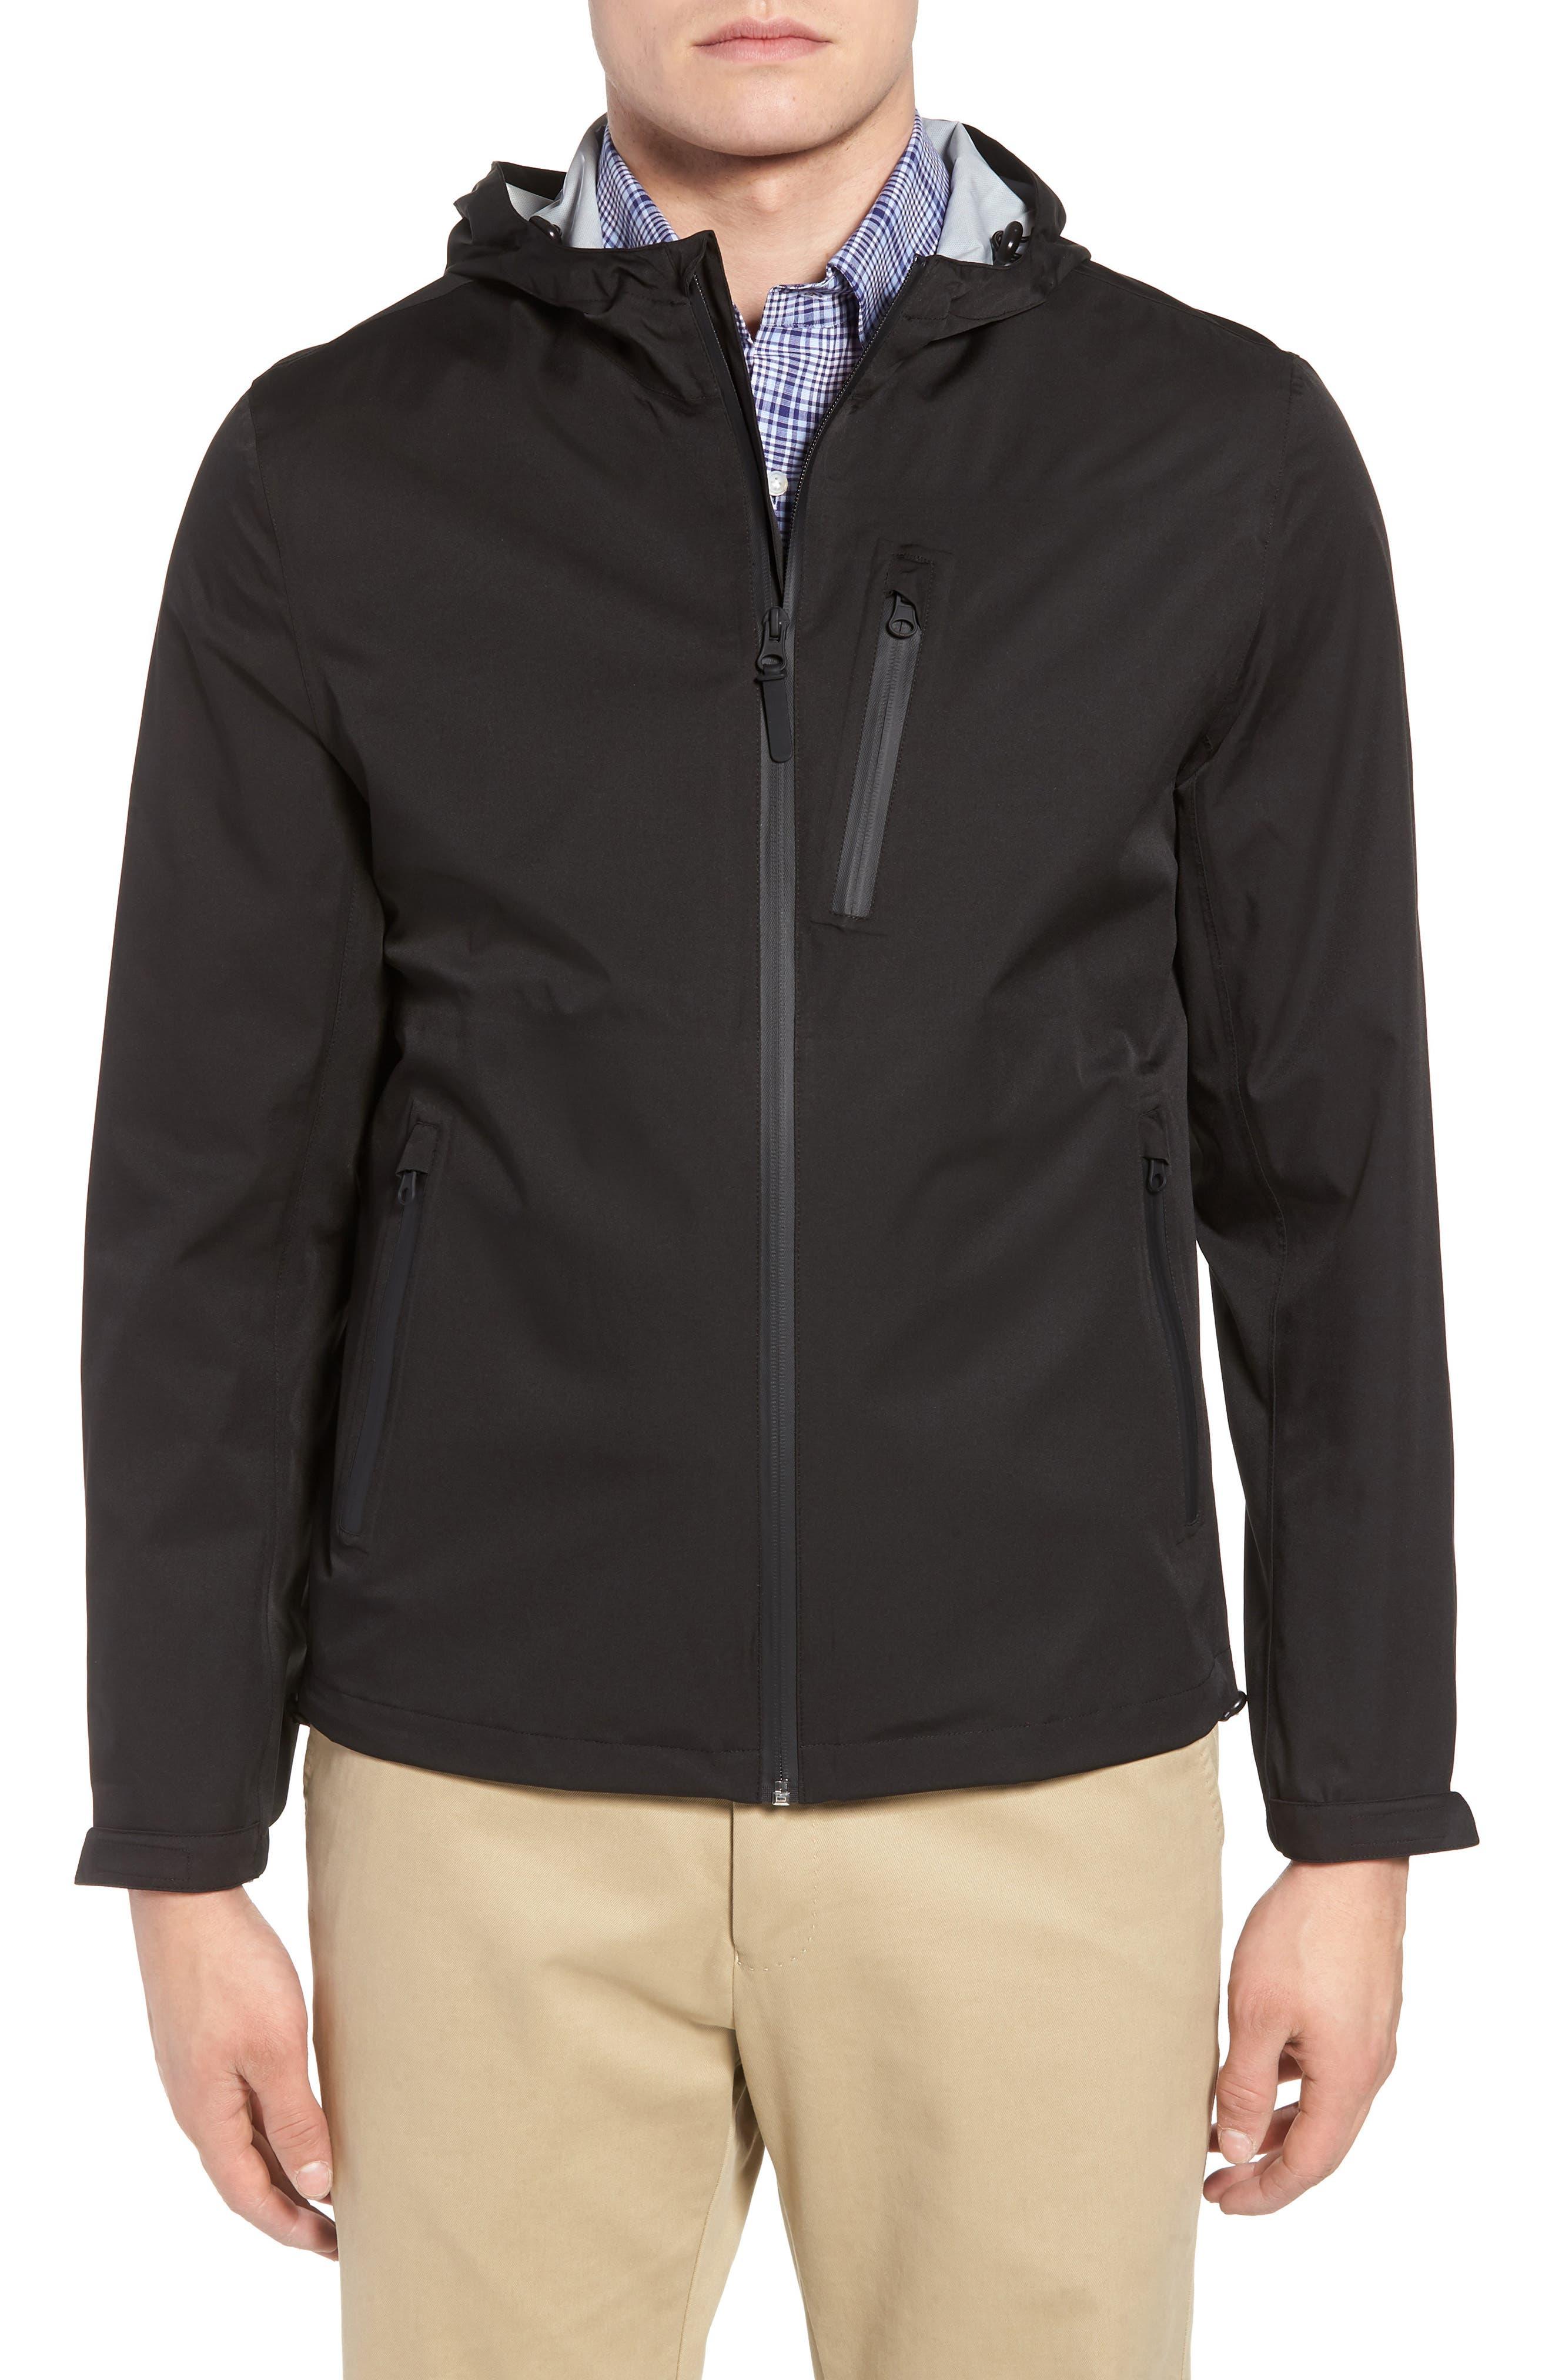 Cole Haan Signature Packable Water Resistant Jacket